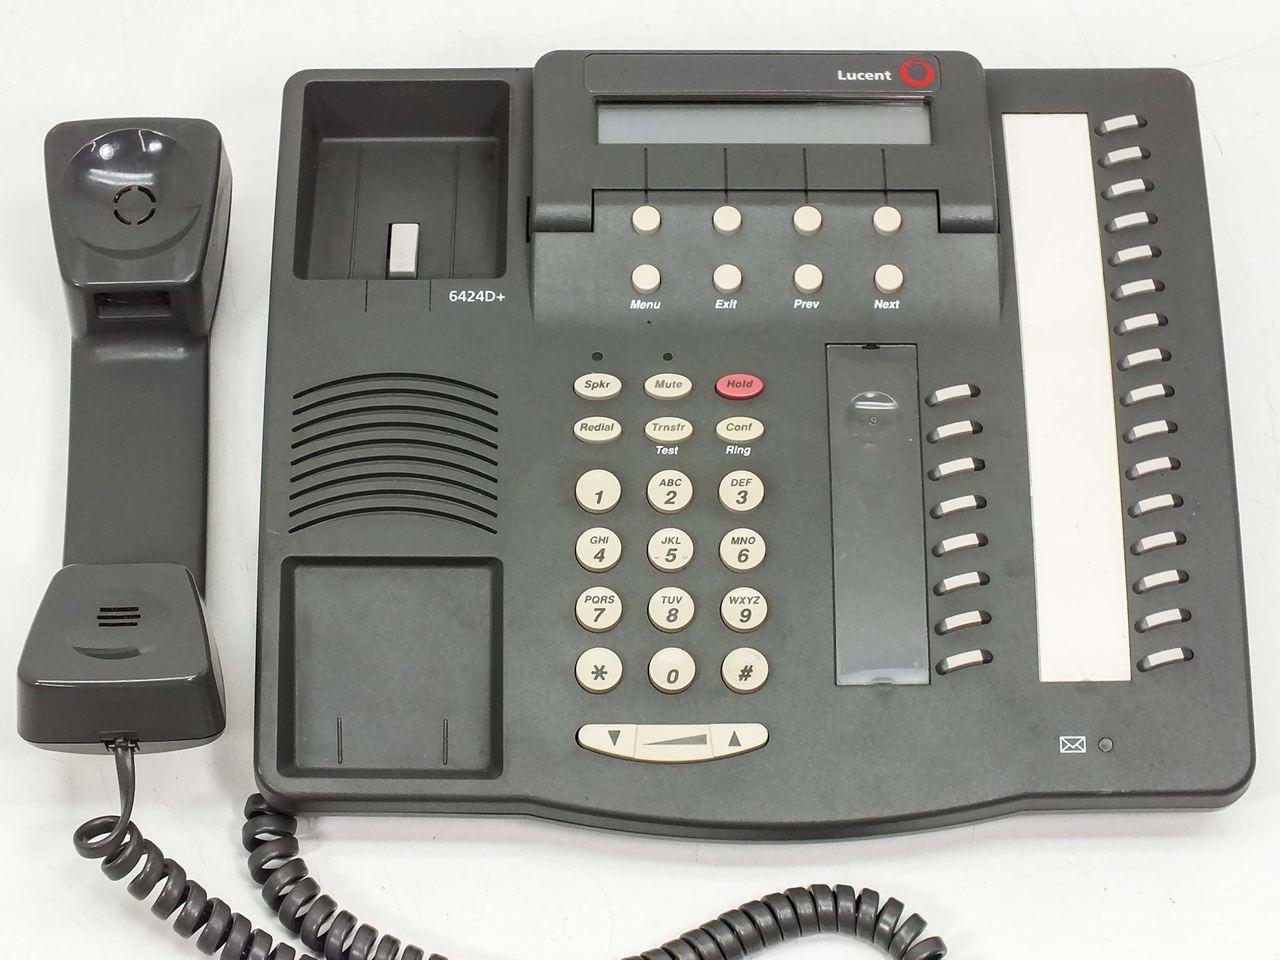 Lucent 6424D Office Phone